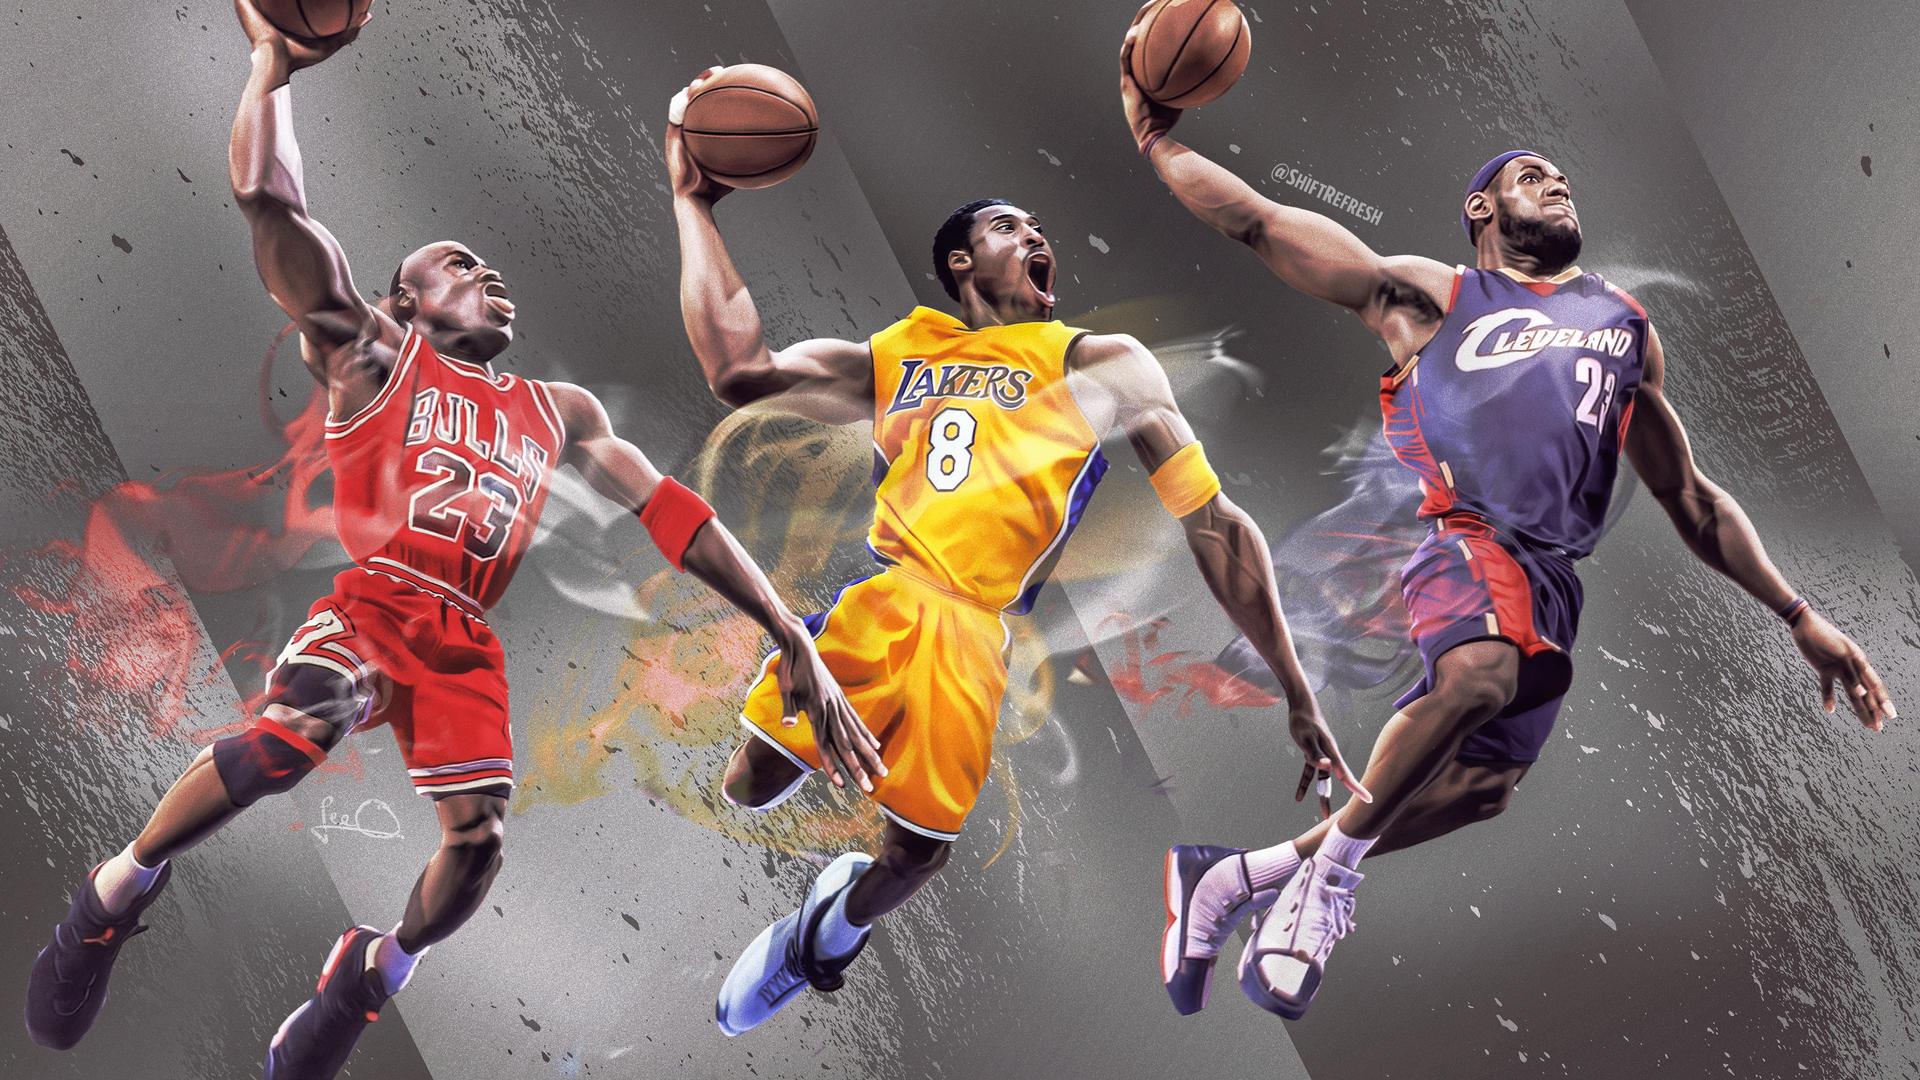 Jordan Kobe Lebron Nba 4k Wallpaper By Skythlee On Deviantart